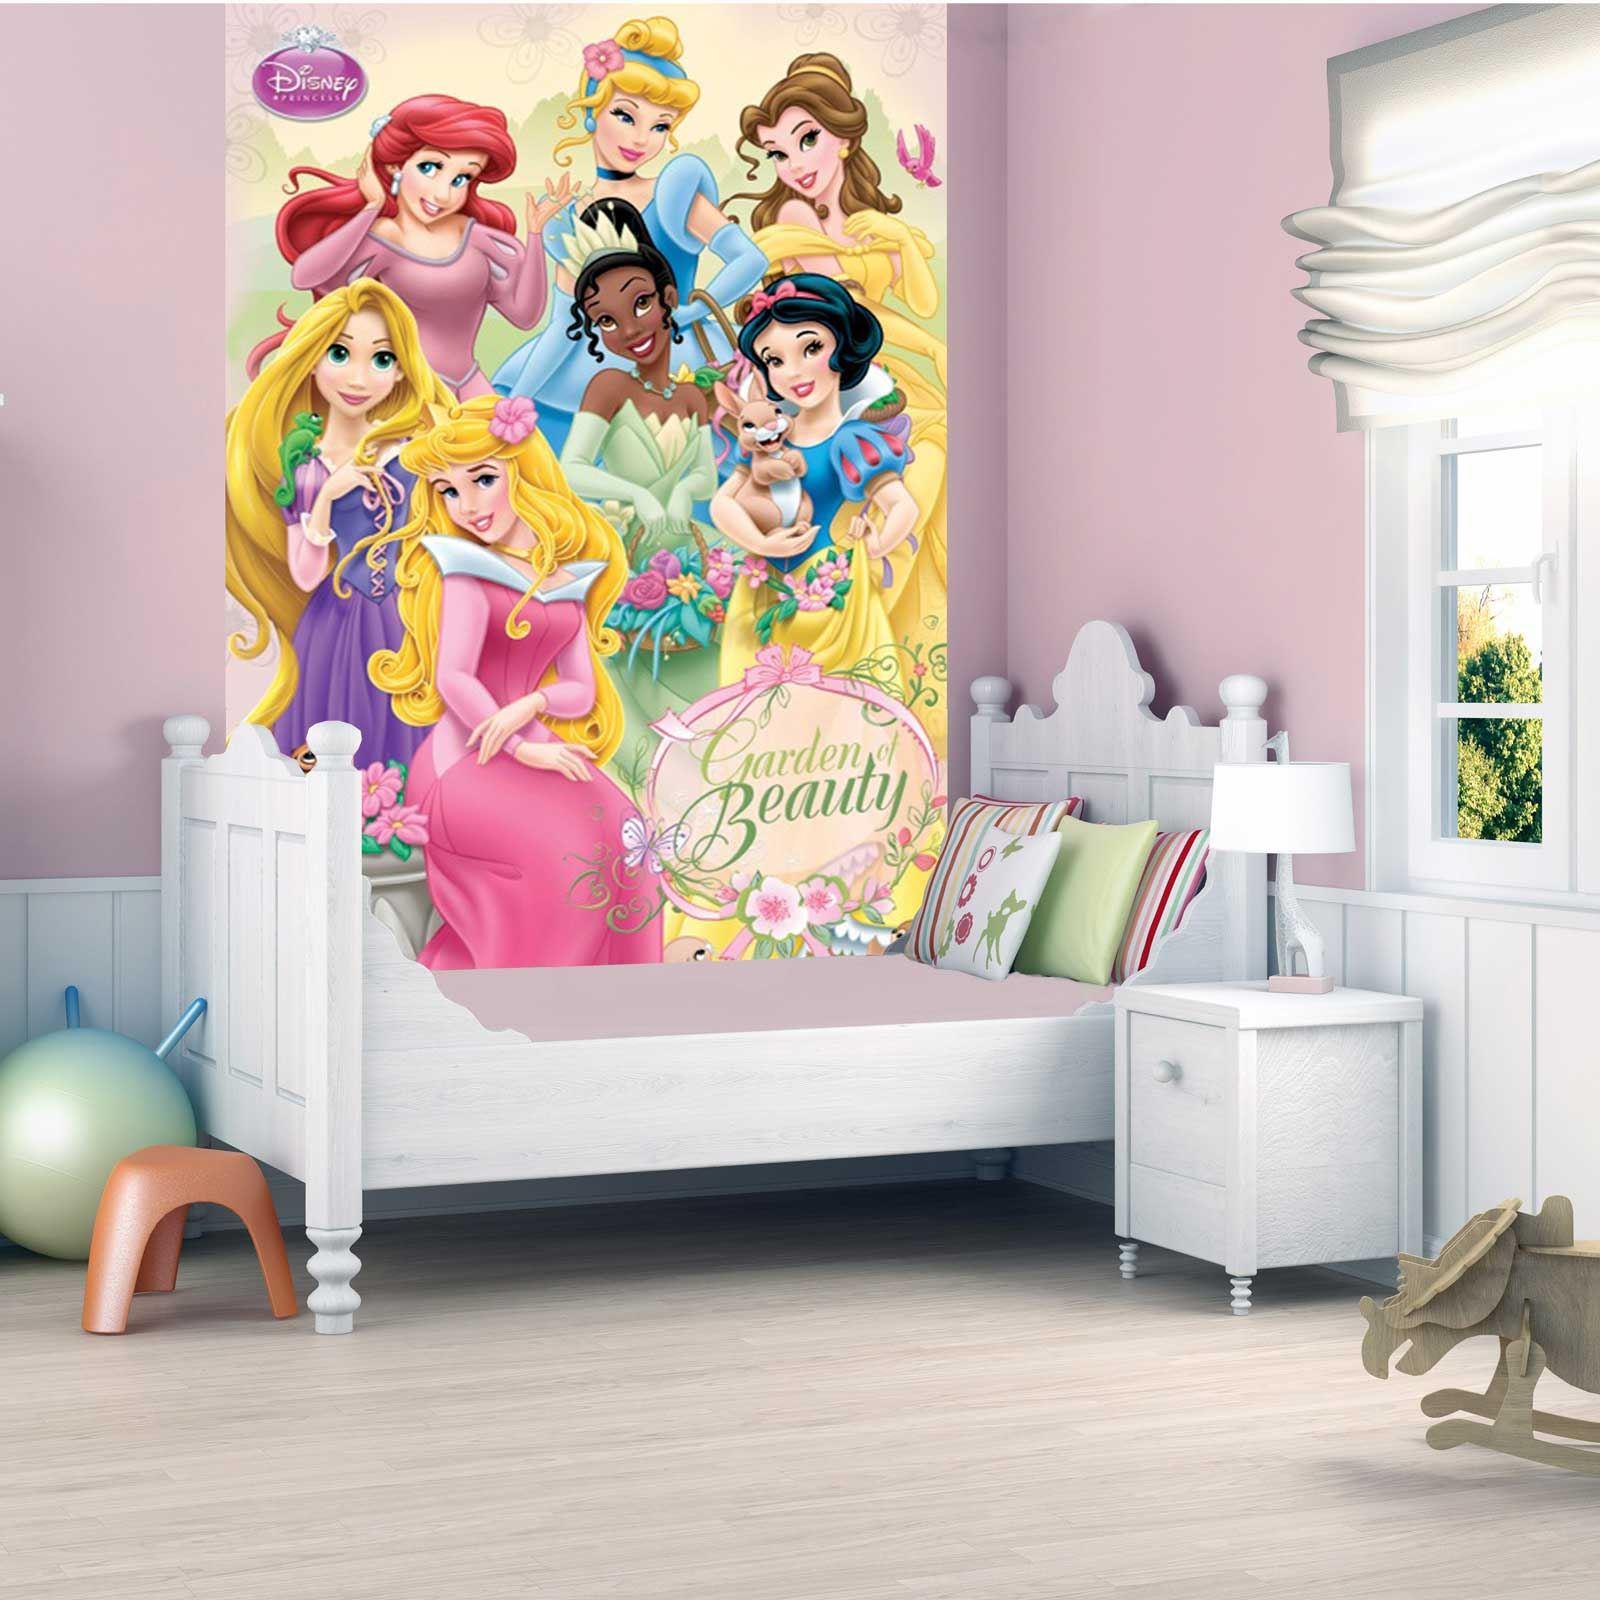 Di disney frozen wall murals - Disney Princess Wallpaper Wall Mural 232cm X 158cm New 3 Eur 27 25 3 Di 3 Vedi Altro